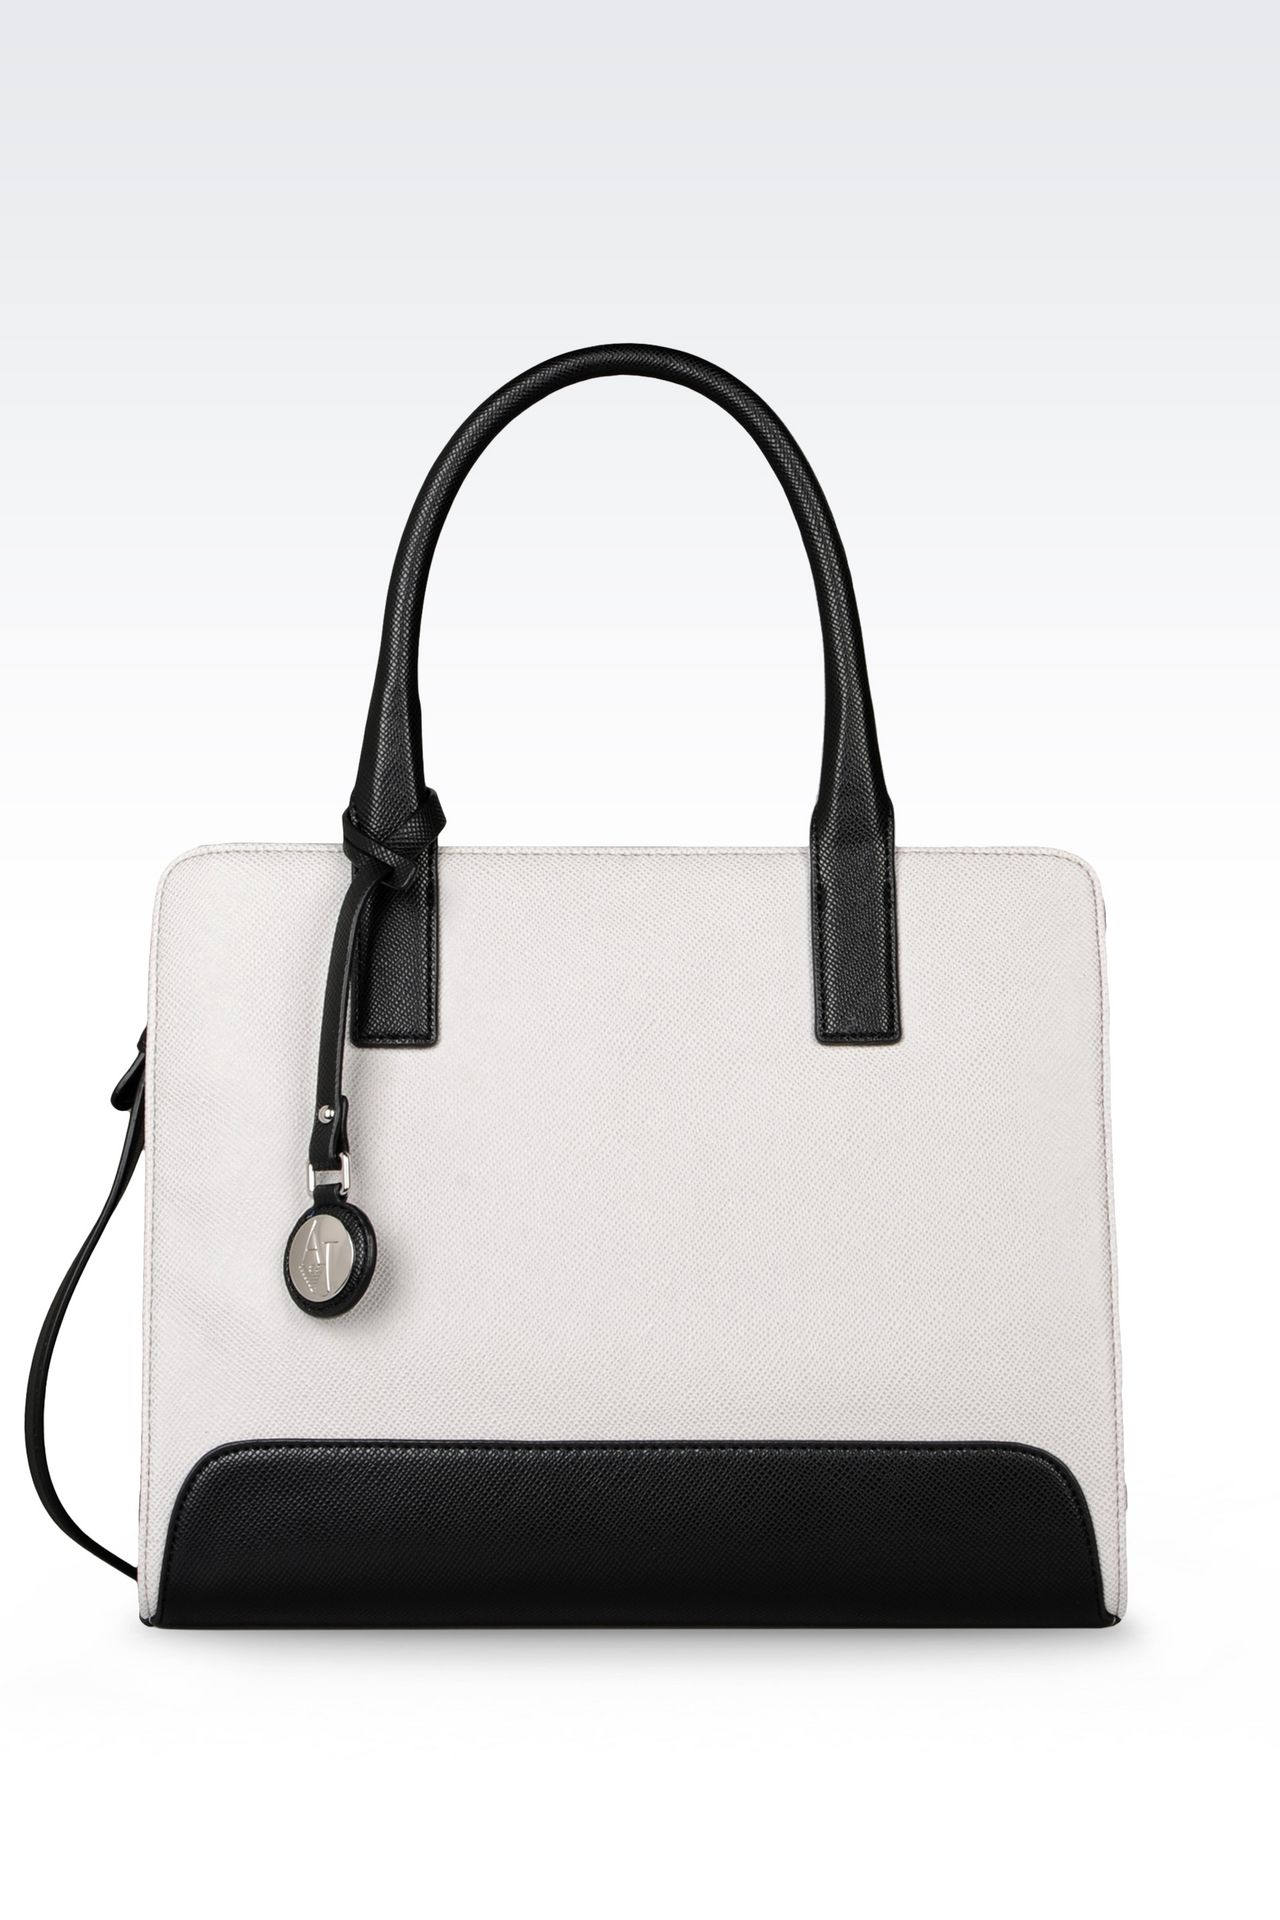 armani jeans women shopper bag in faux leather pvc. Black Bedroom Furniture Sets. Home Design Ideas